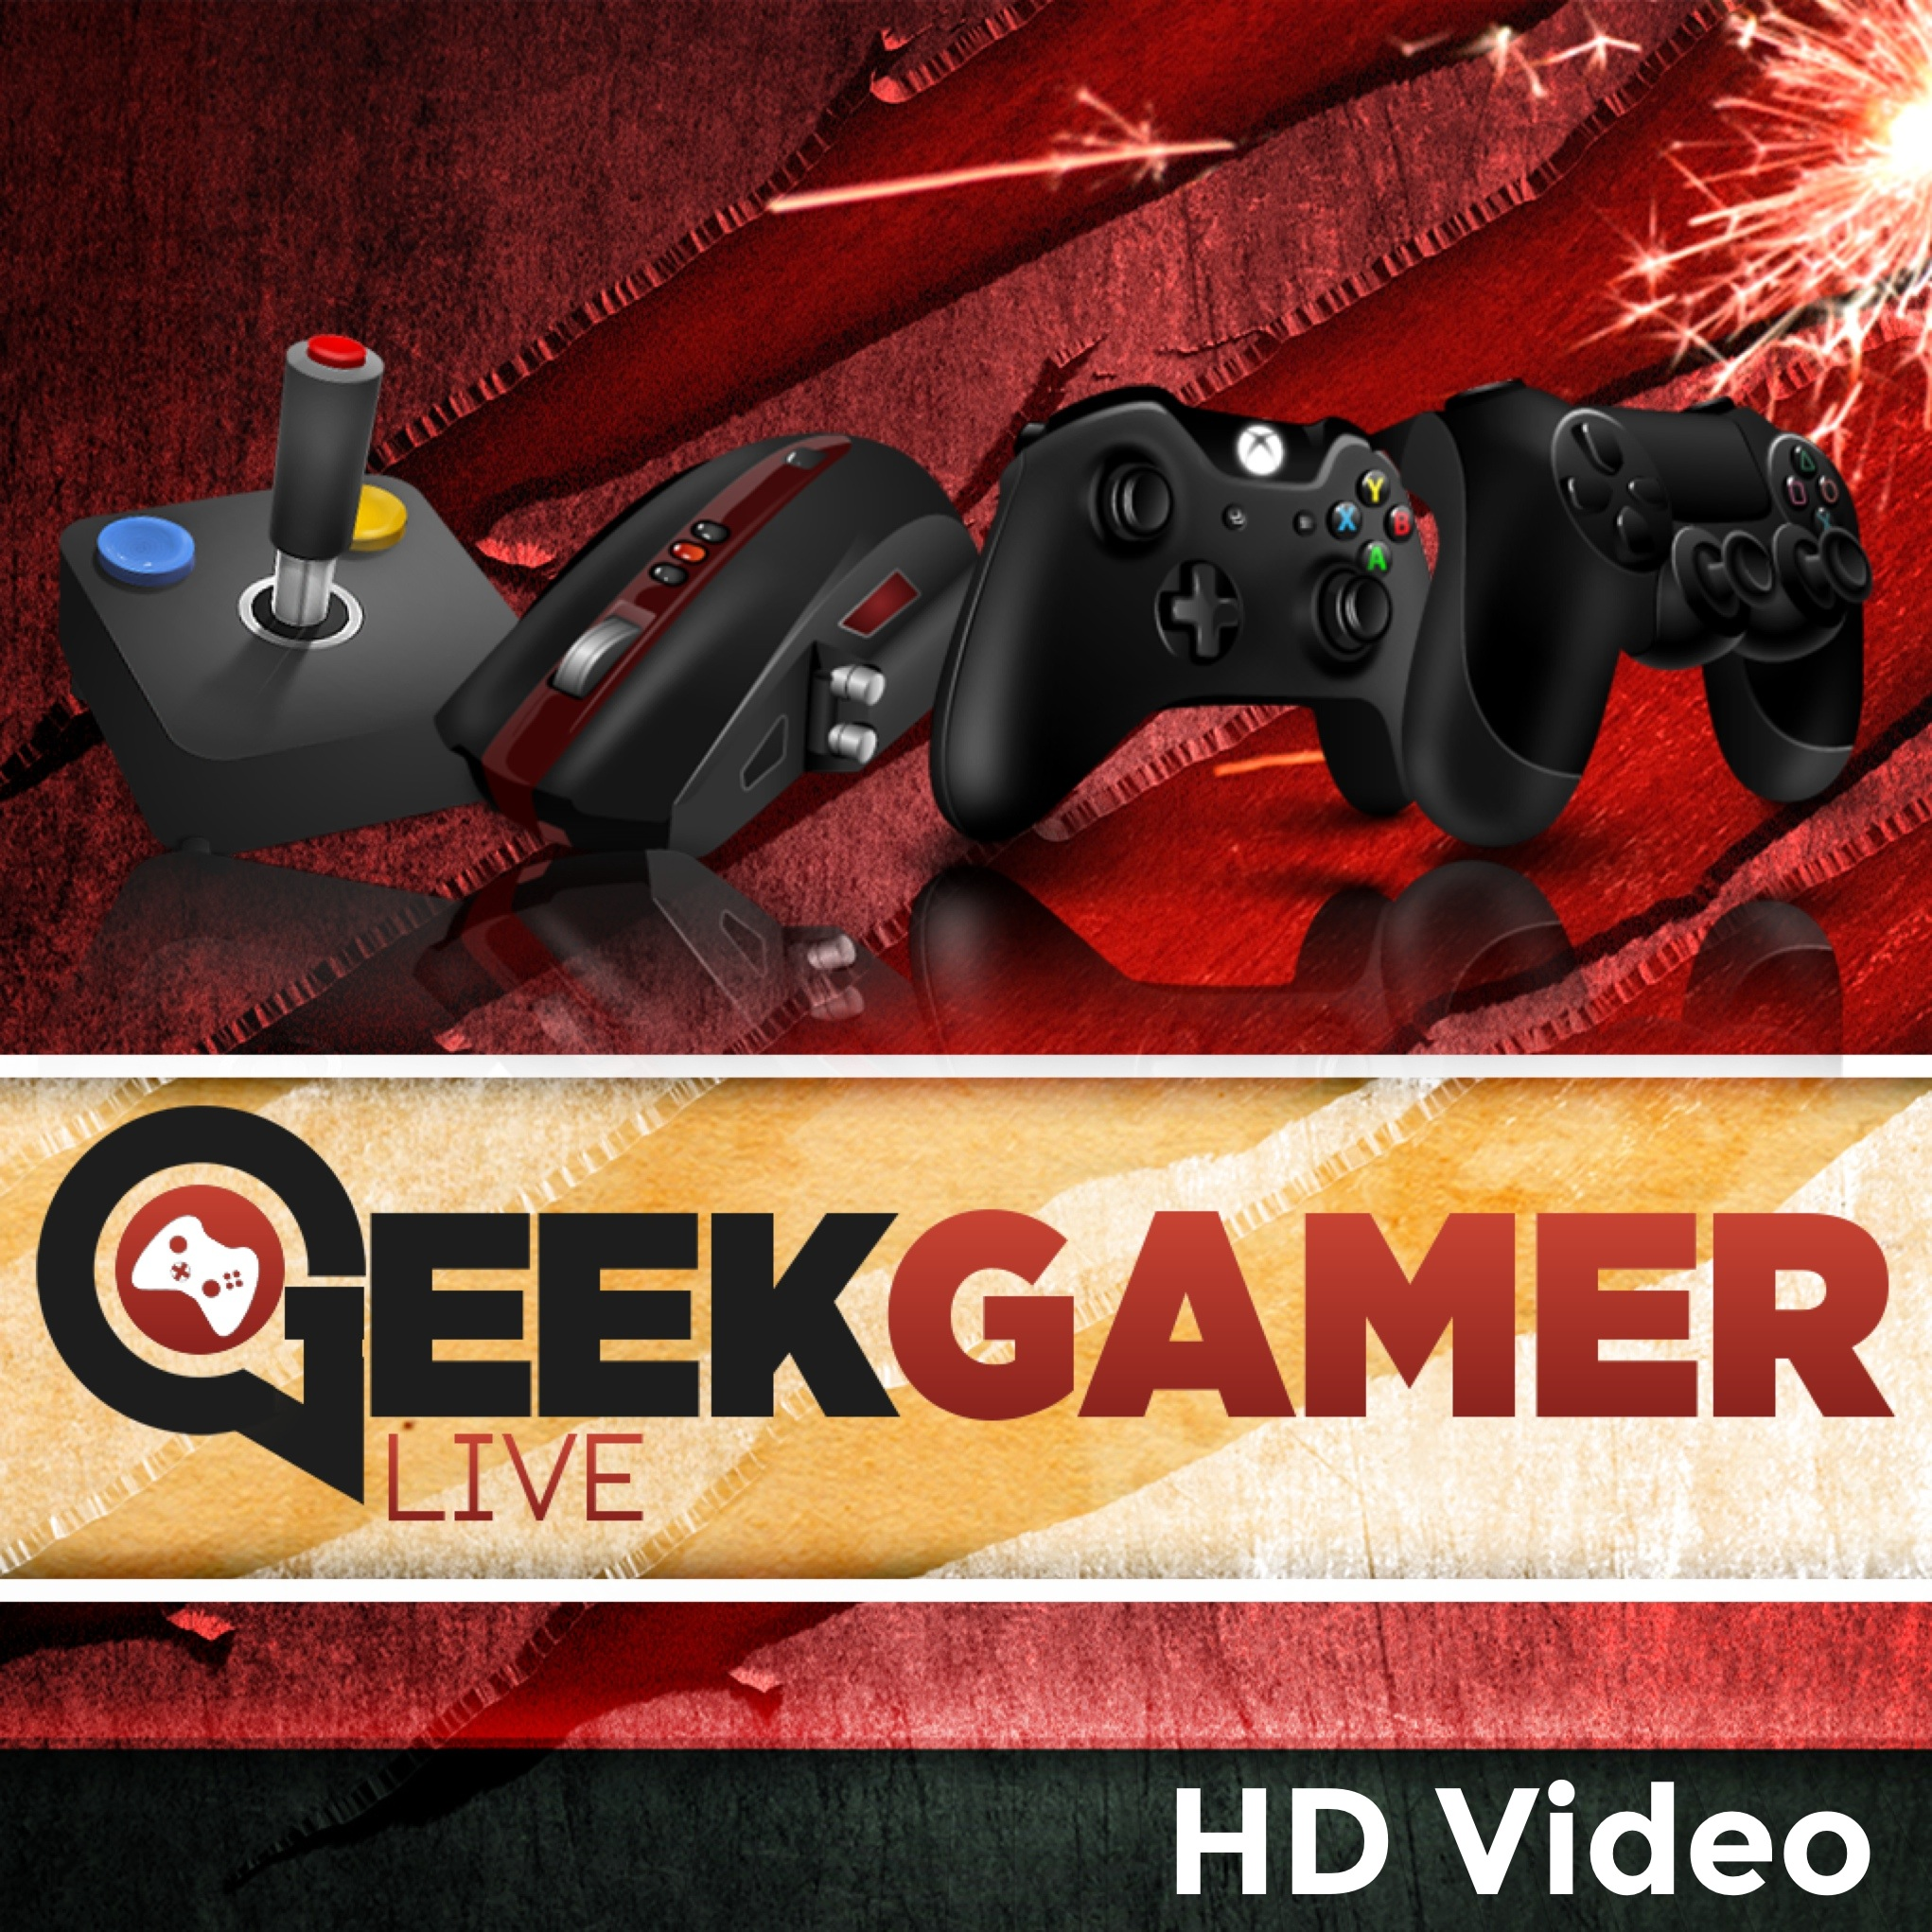 Geek Gamer Live - HD Video